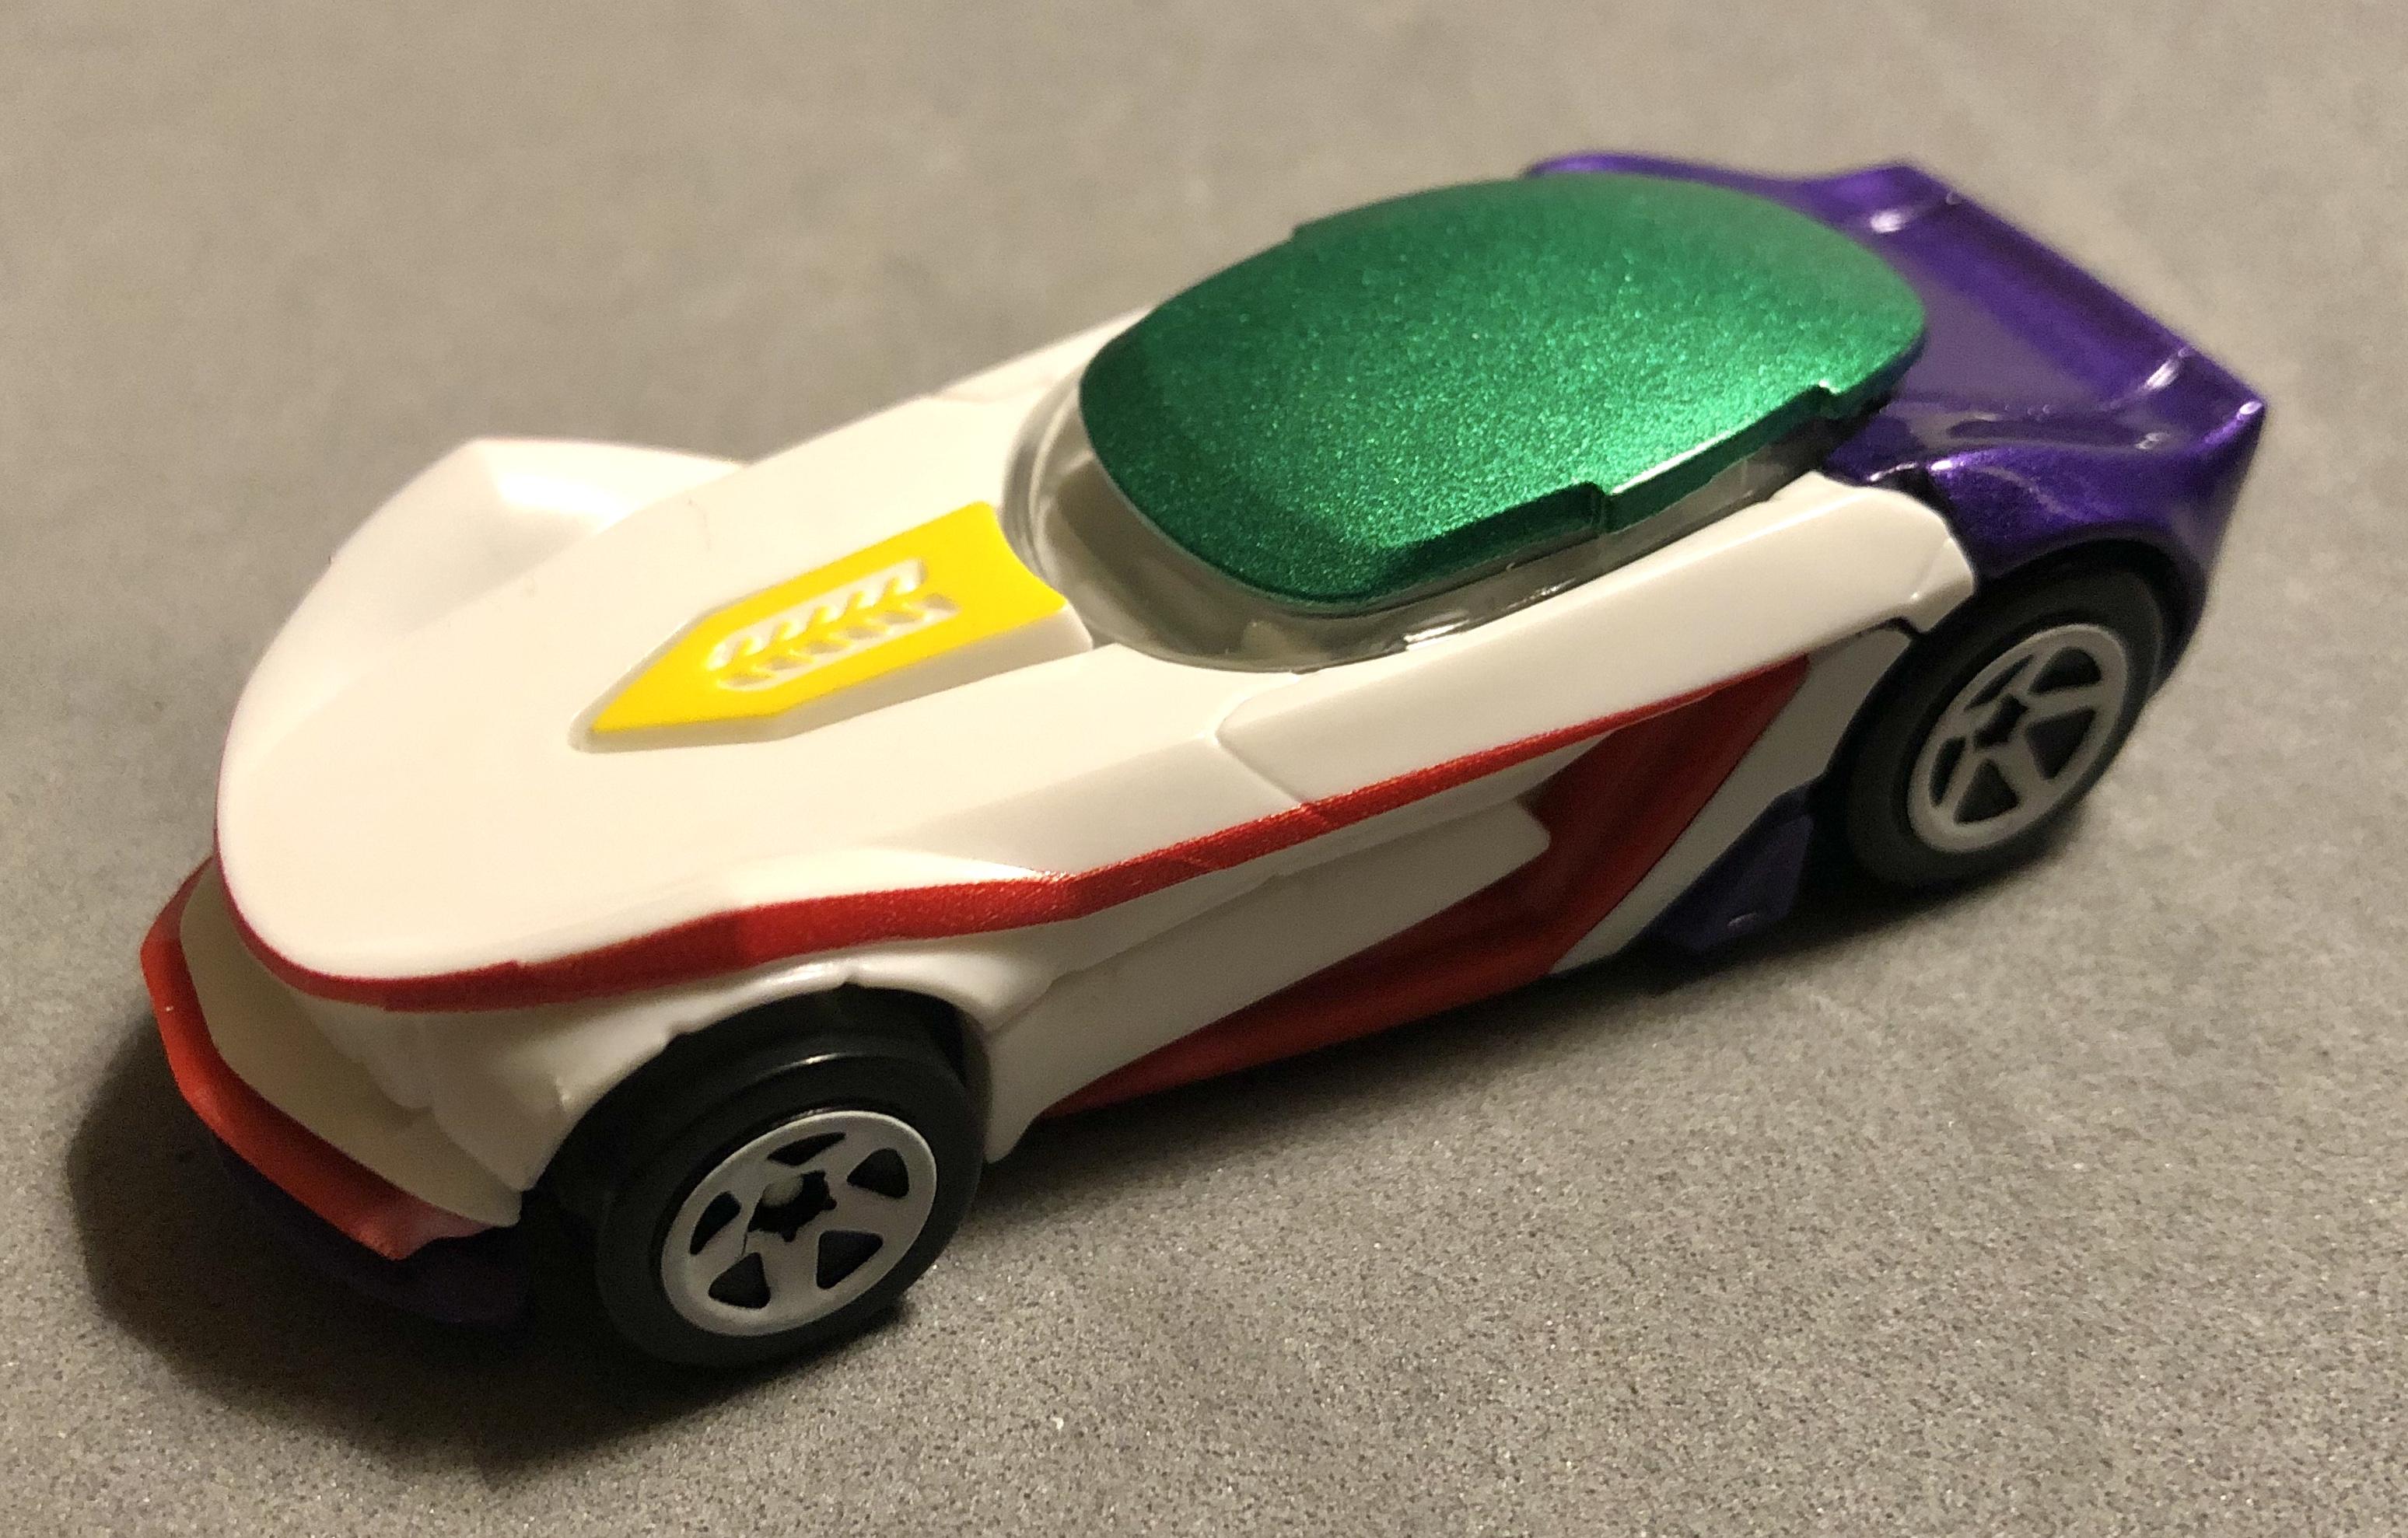 The Joker GT (Action Feature)